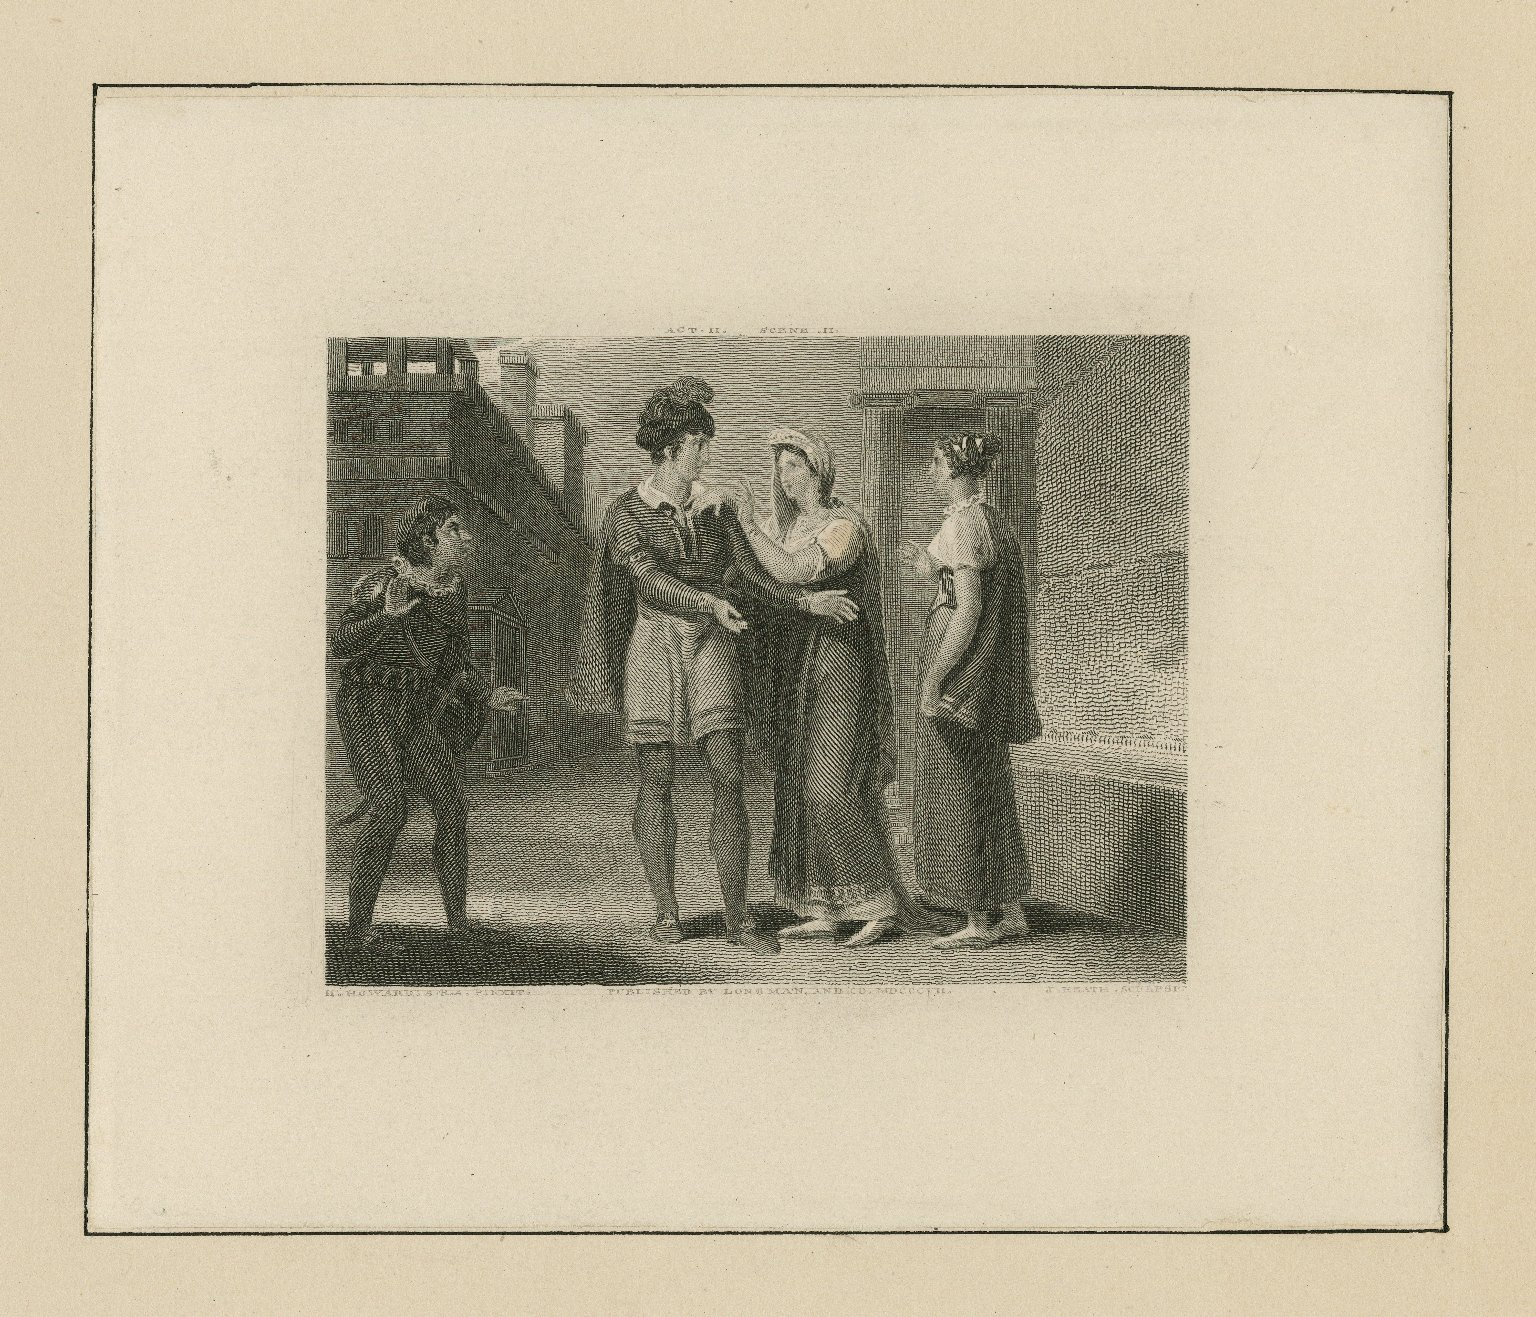 [Comedy of errors] act II, scene II [graphic] / H. Howard A.R.A. pinxit ; J. Heath sculpsit.